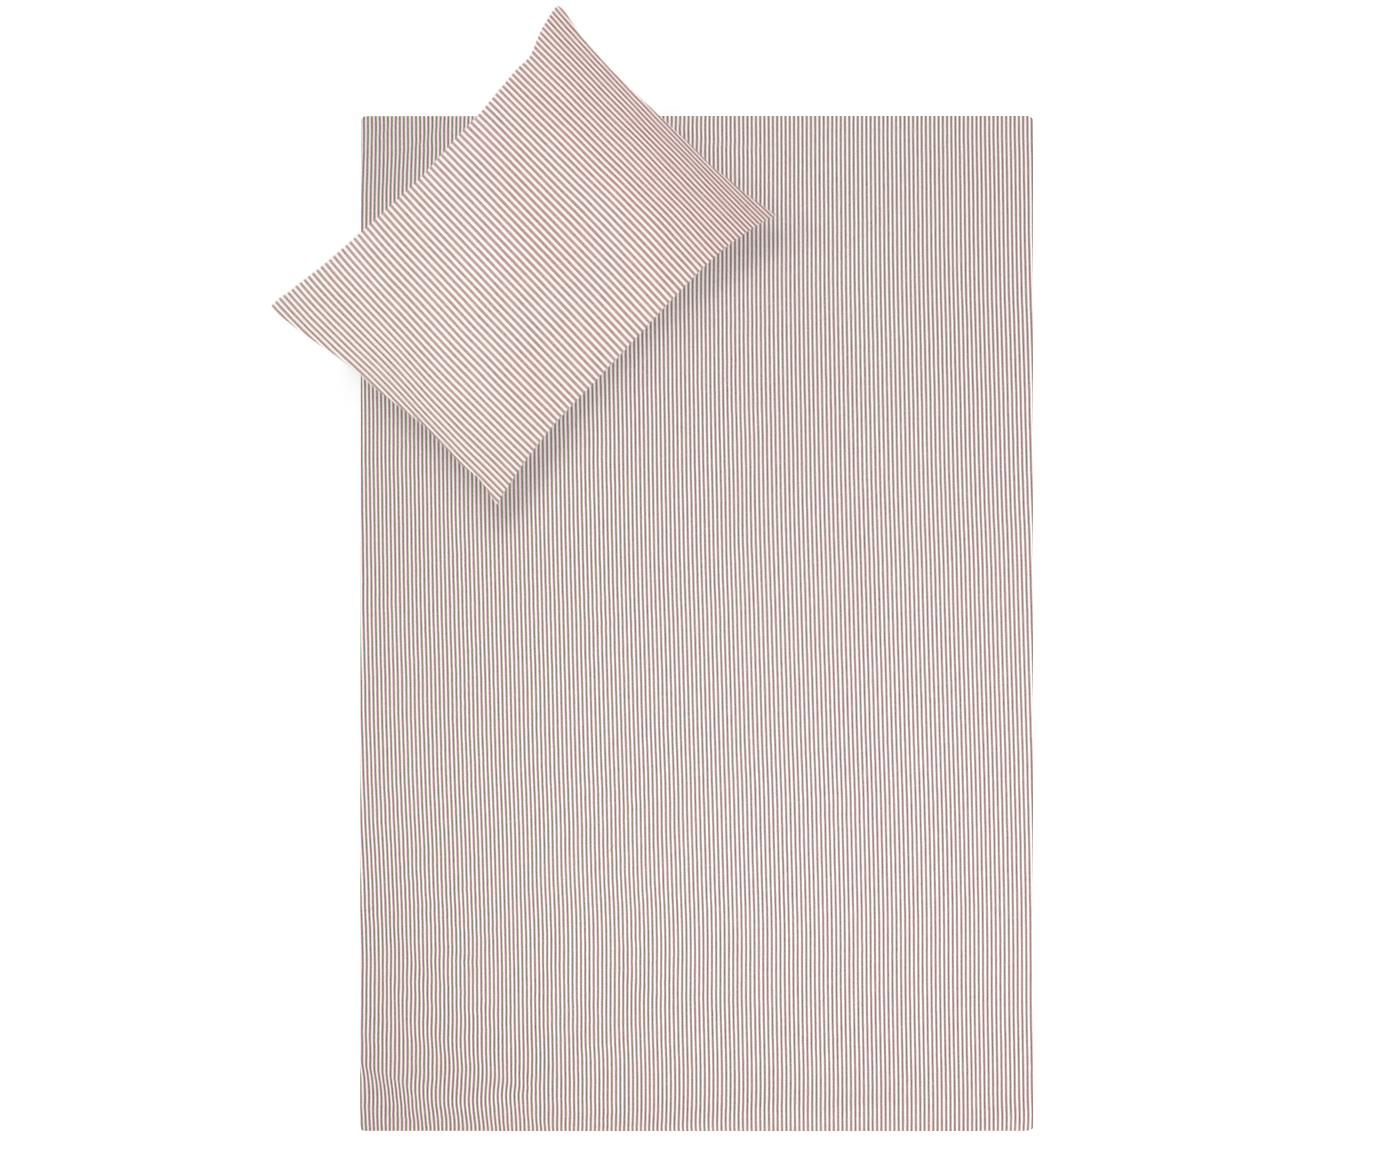 Parure copripiumino in cotone ranforce Ellie, Tessuto: Renforcé, Bianco, rosso, 155 x 200 cm